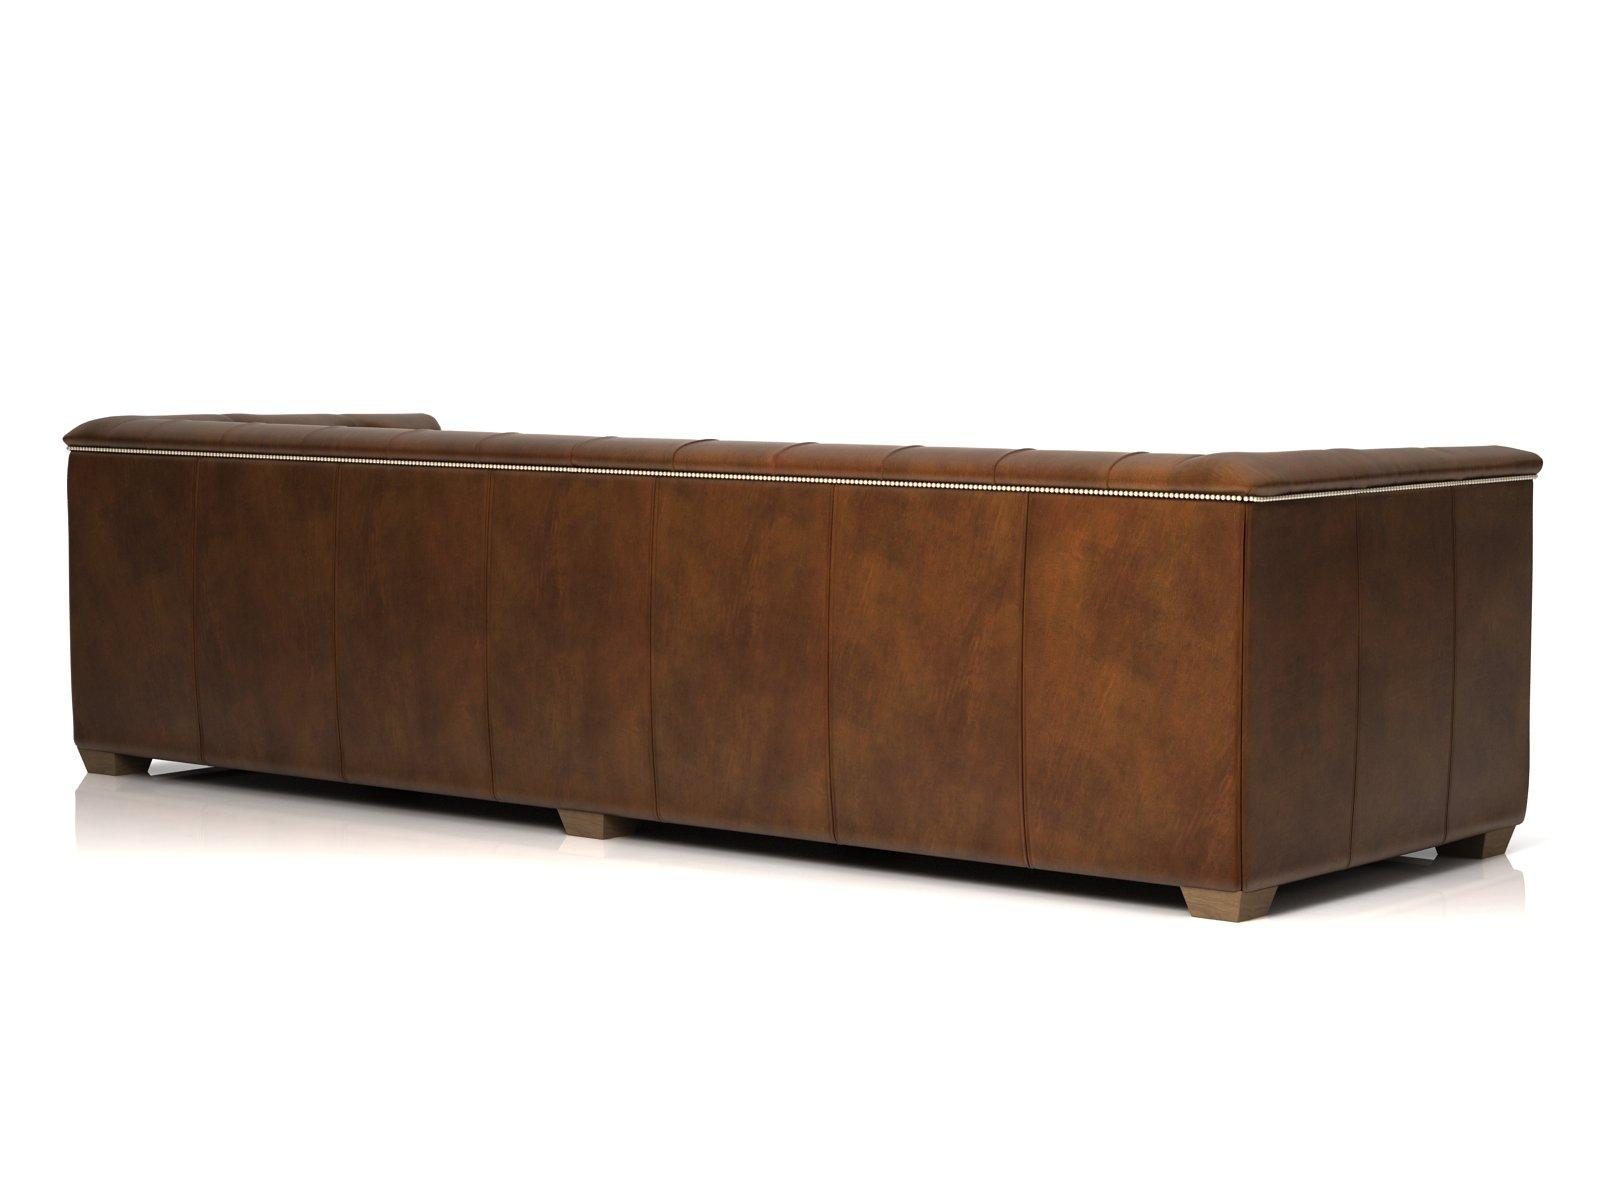 savoy leather sofa restoration hardware light brown bed 3d model